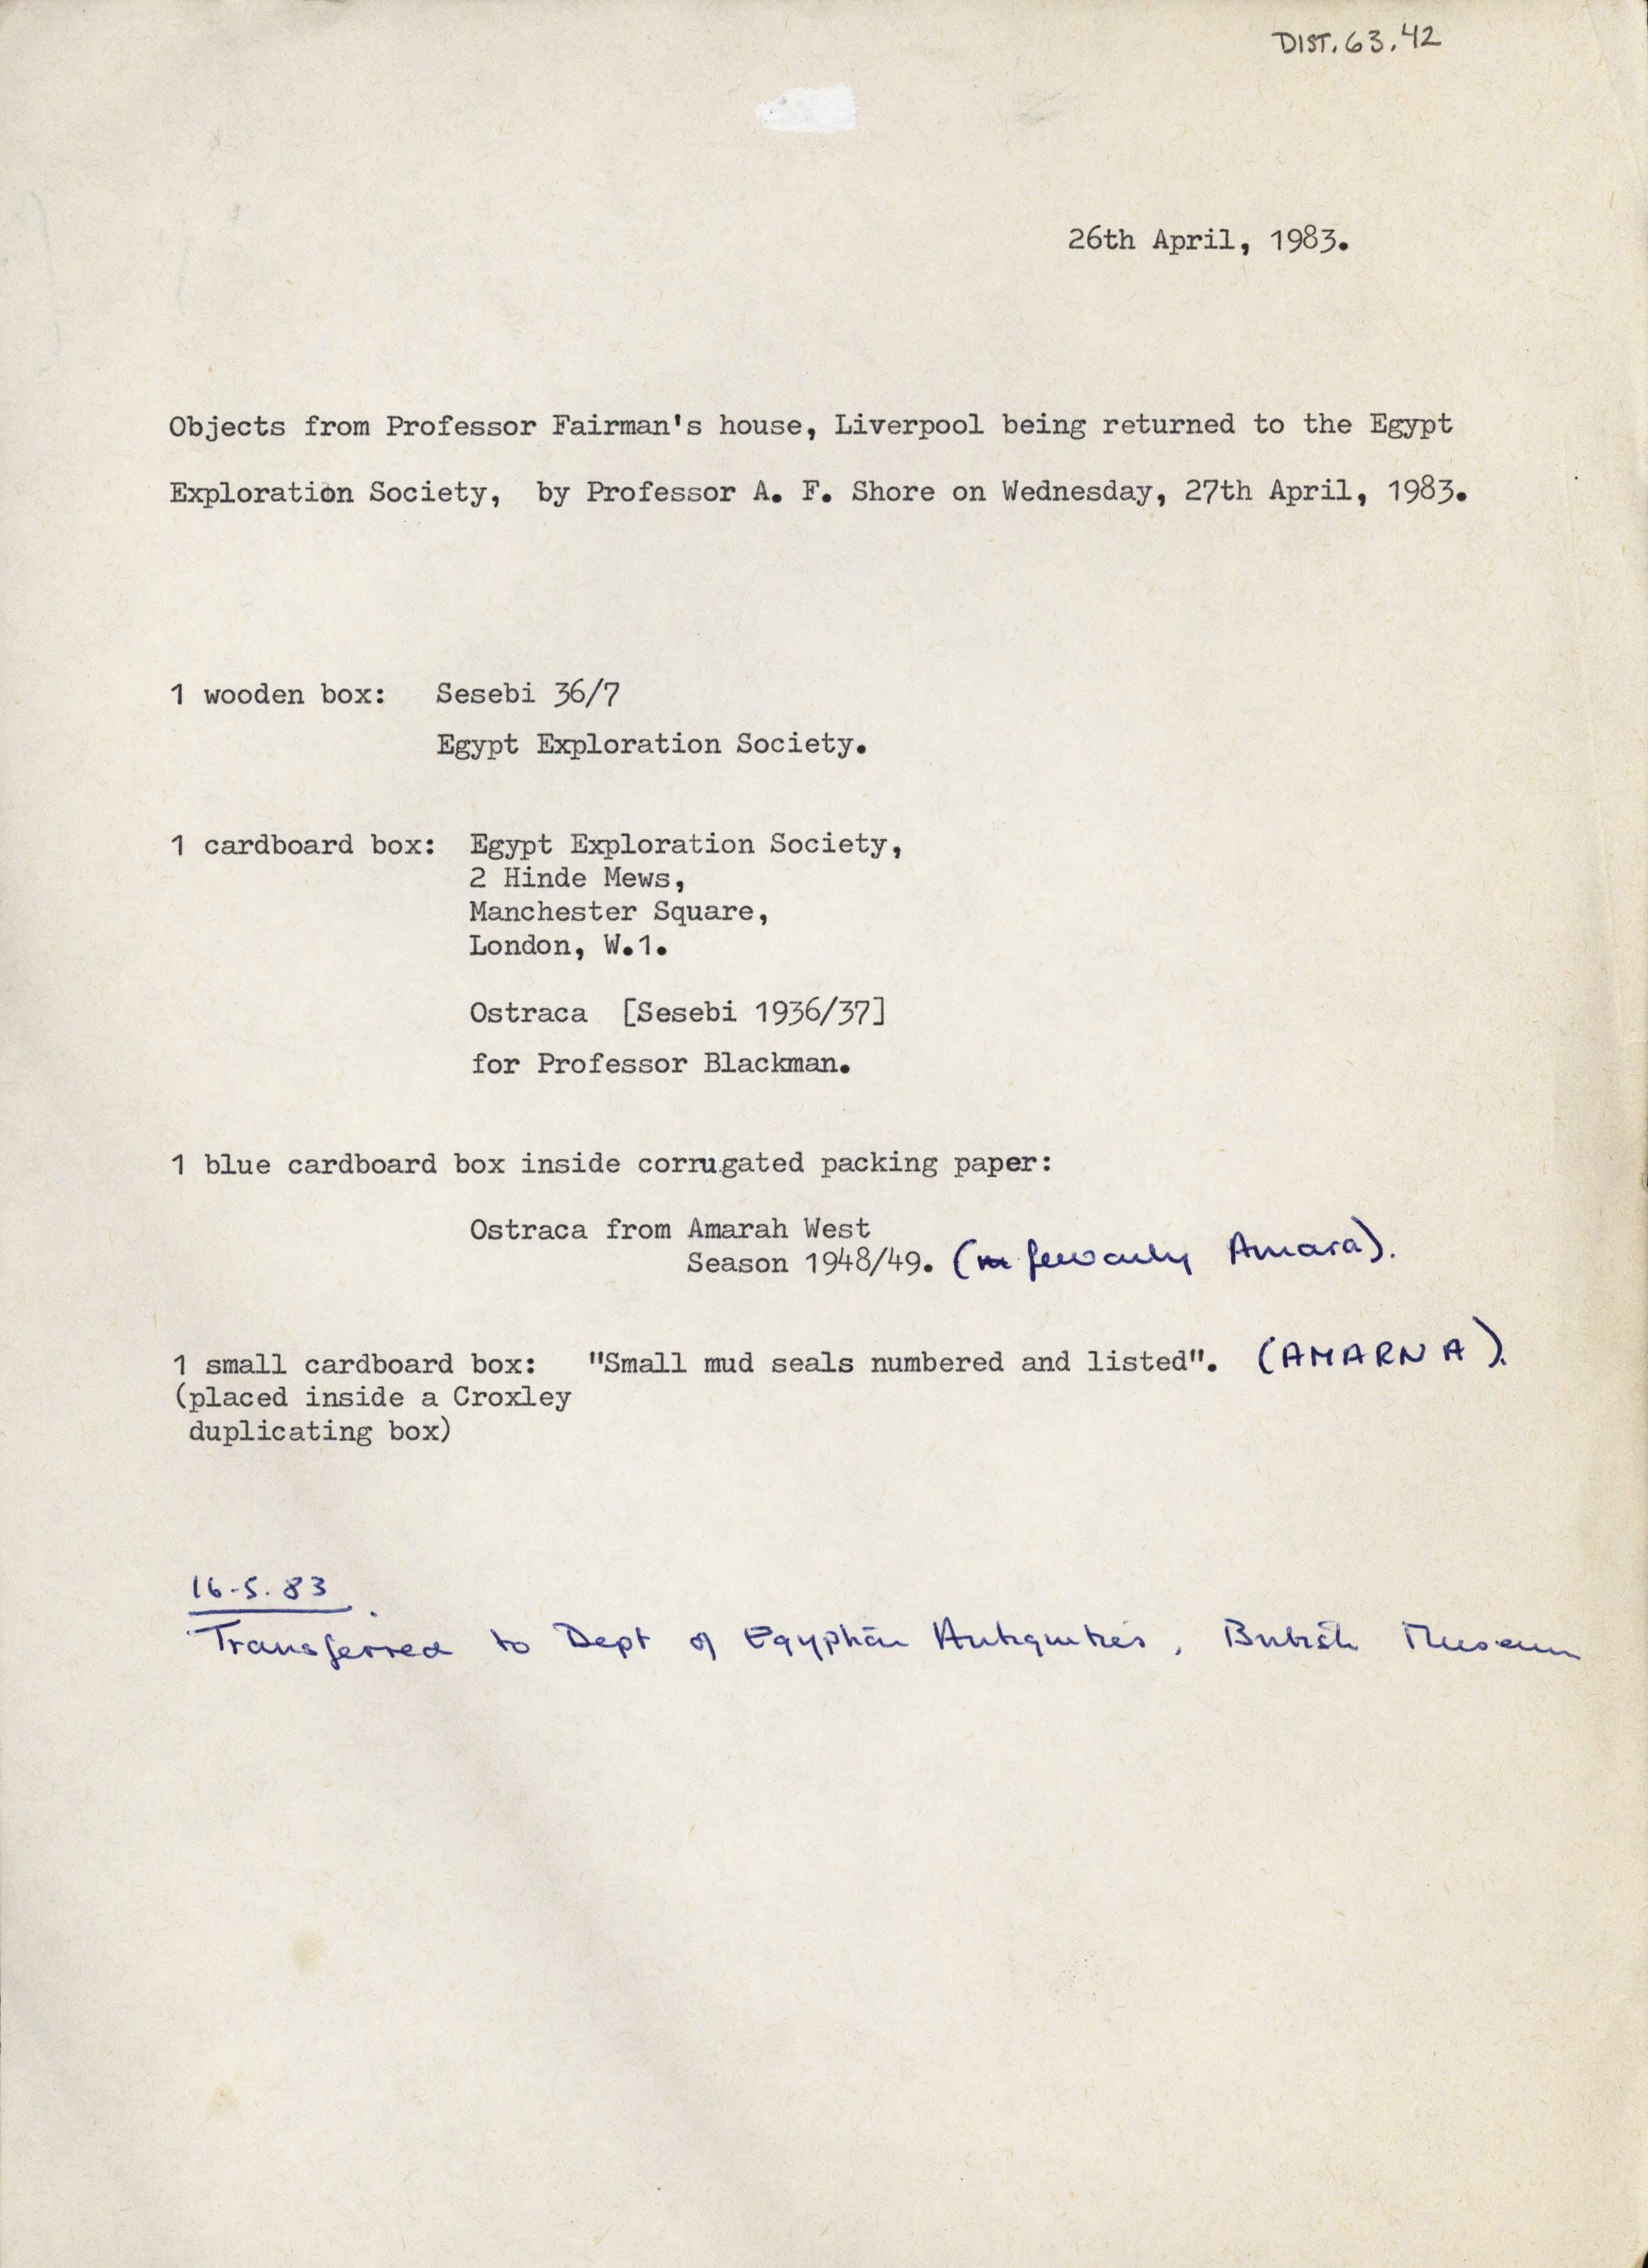 1936-39 Amarah West, Sesebi DIST.63.42